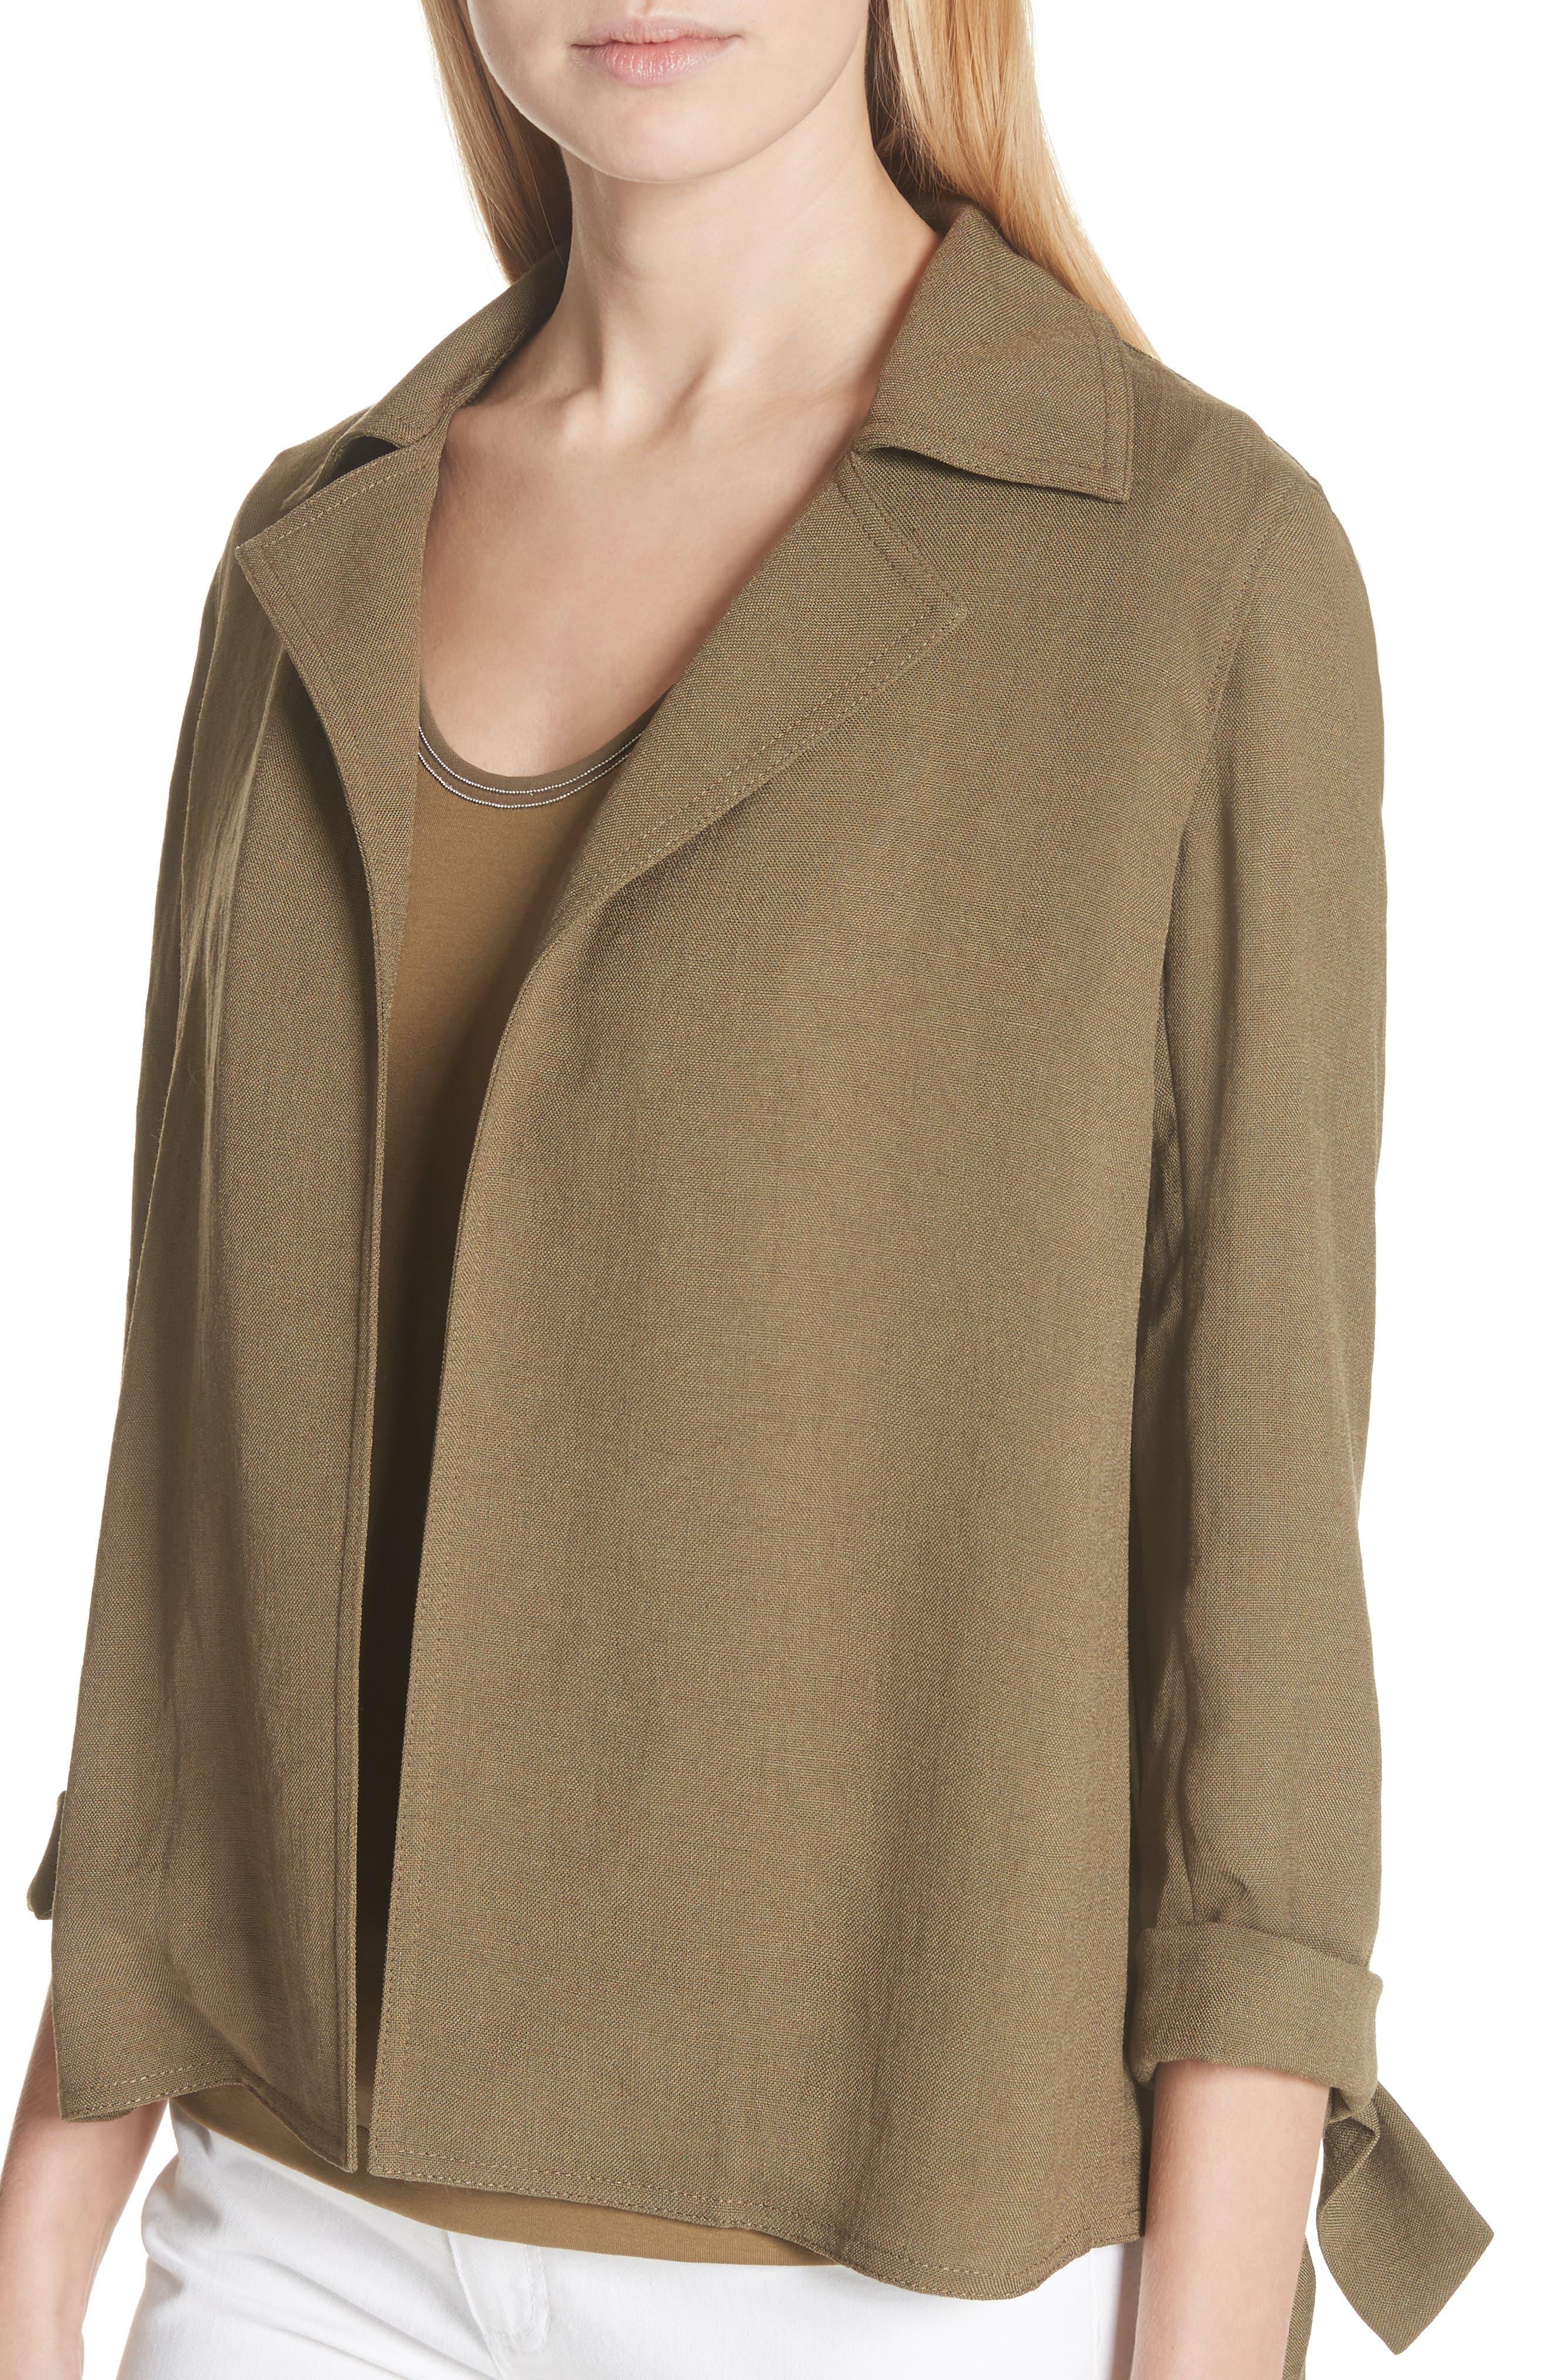 Grant Altruistic Cloth Jacket,                             Alternate thumbnail 4, color,                             342